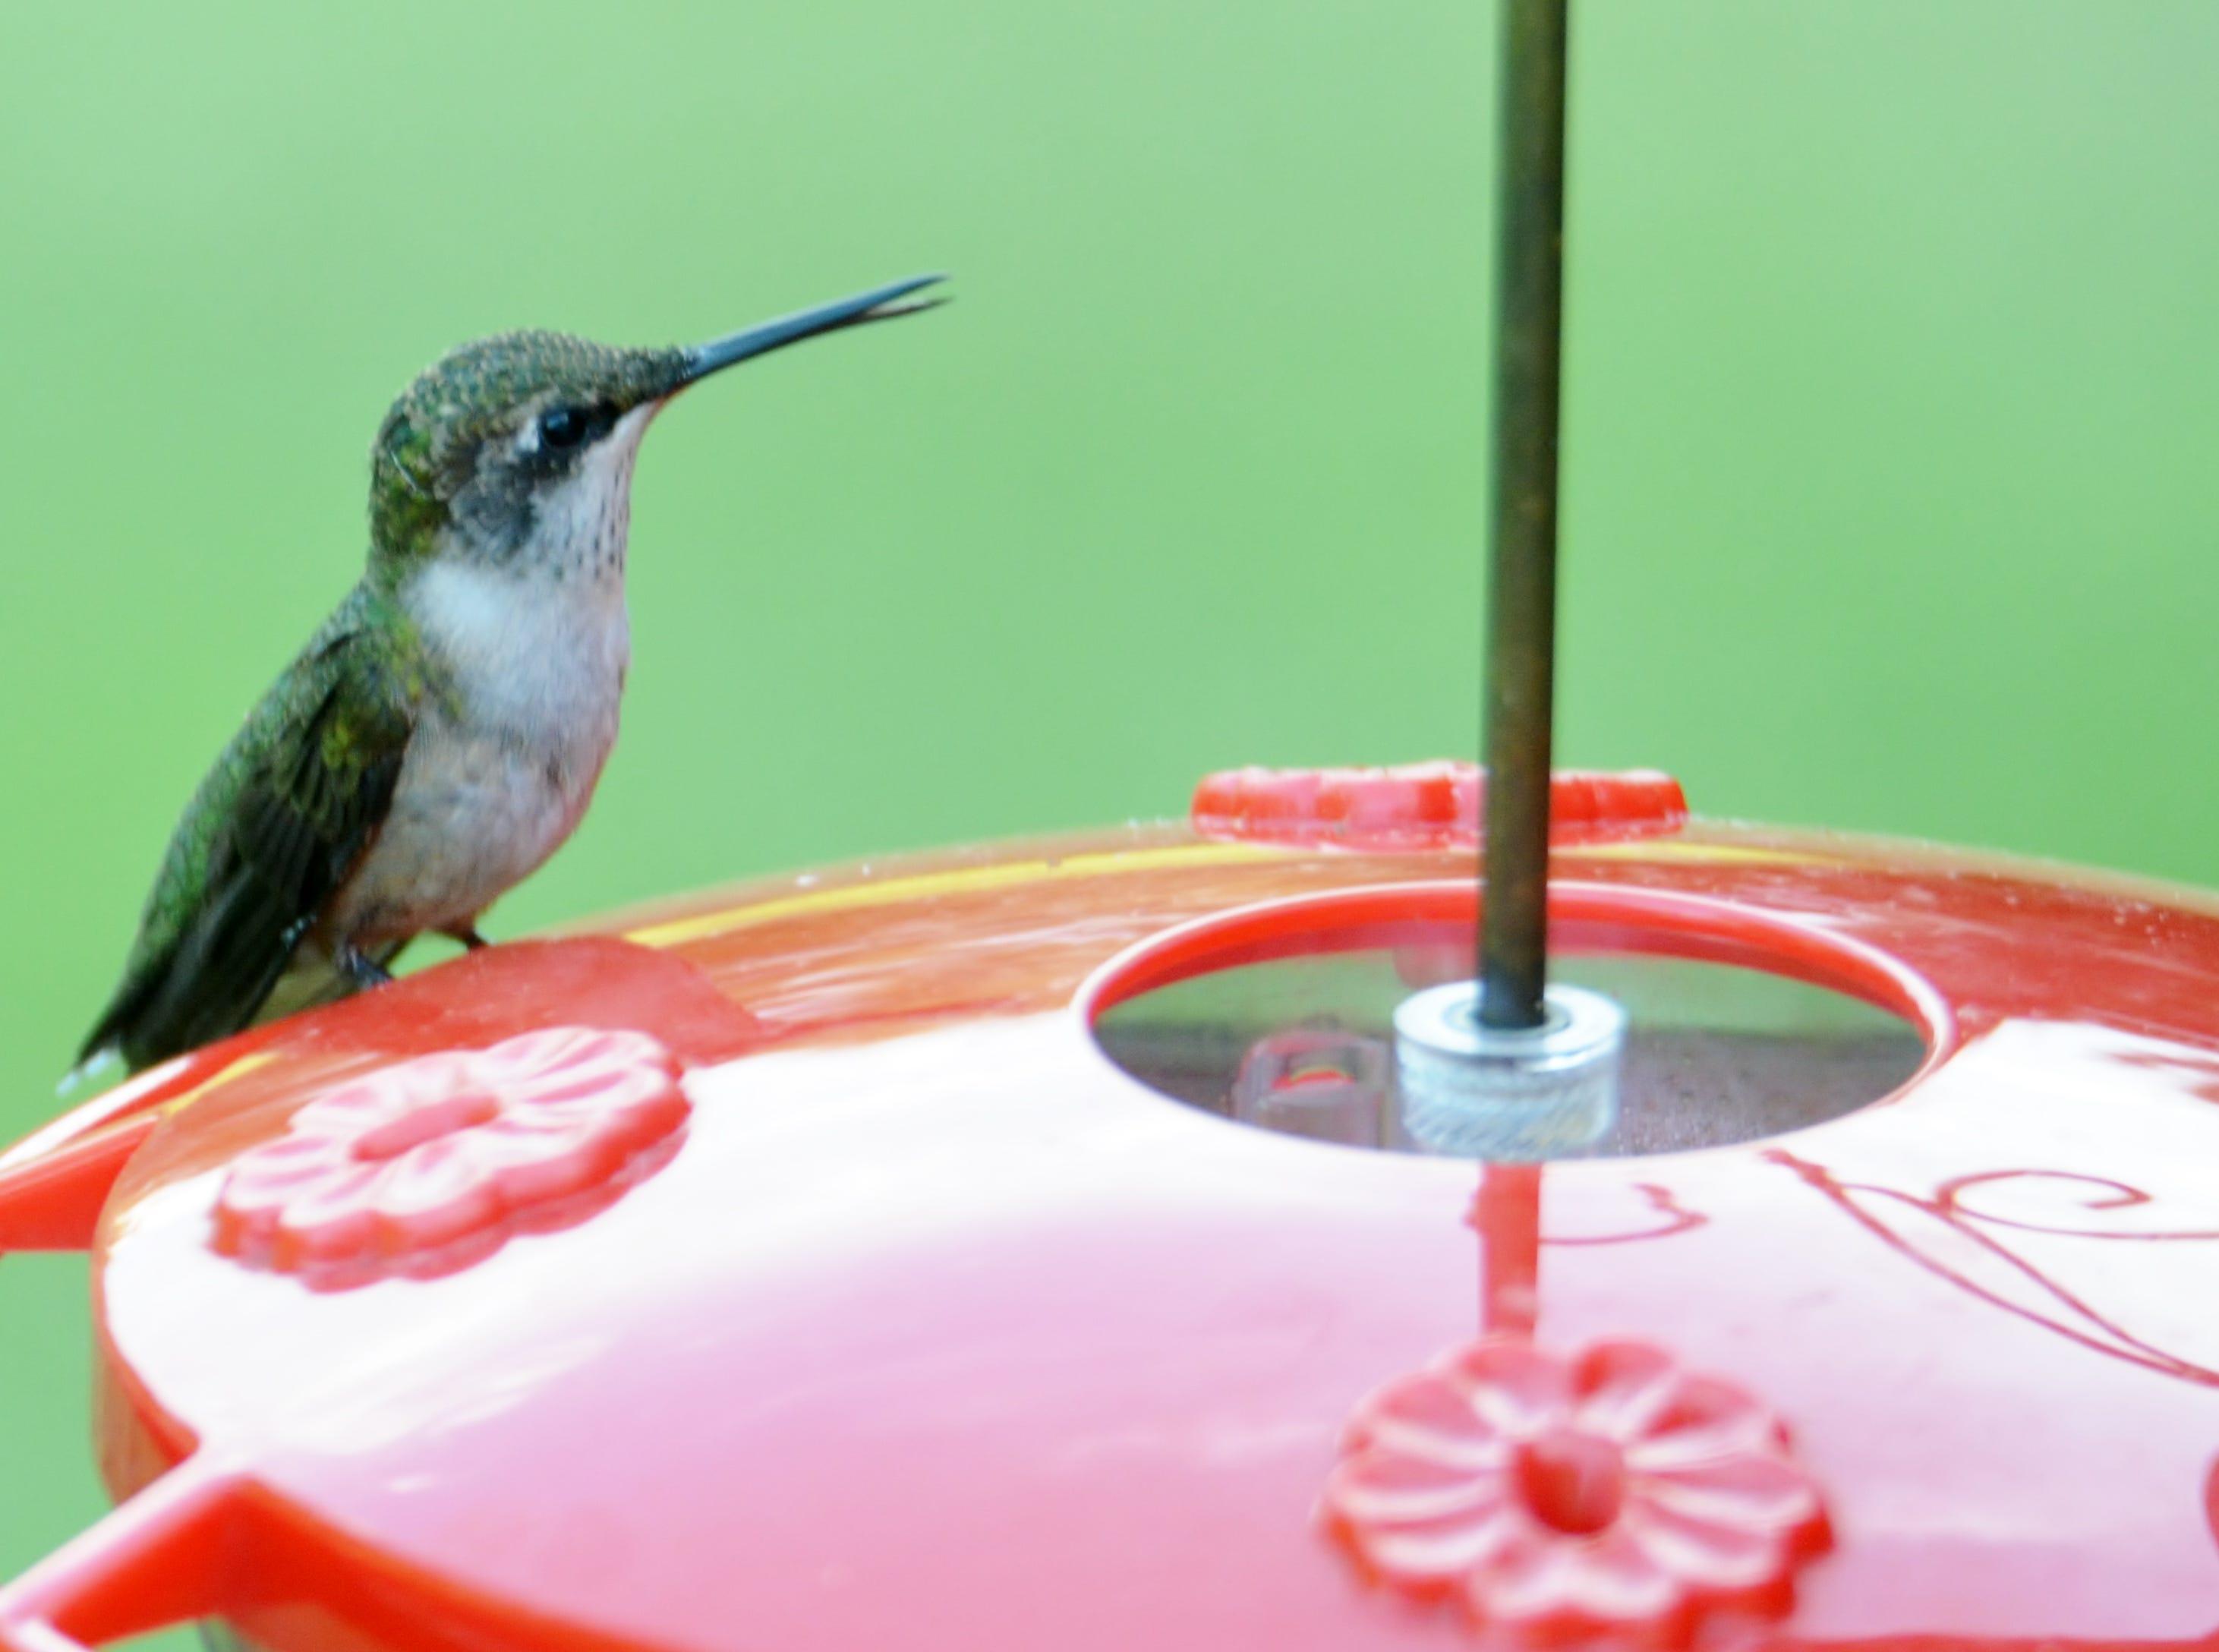 A female hummingbird sits on a feeder, ready to dip its beak in a sugar water mixture.